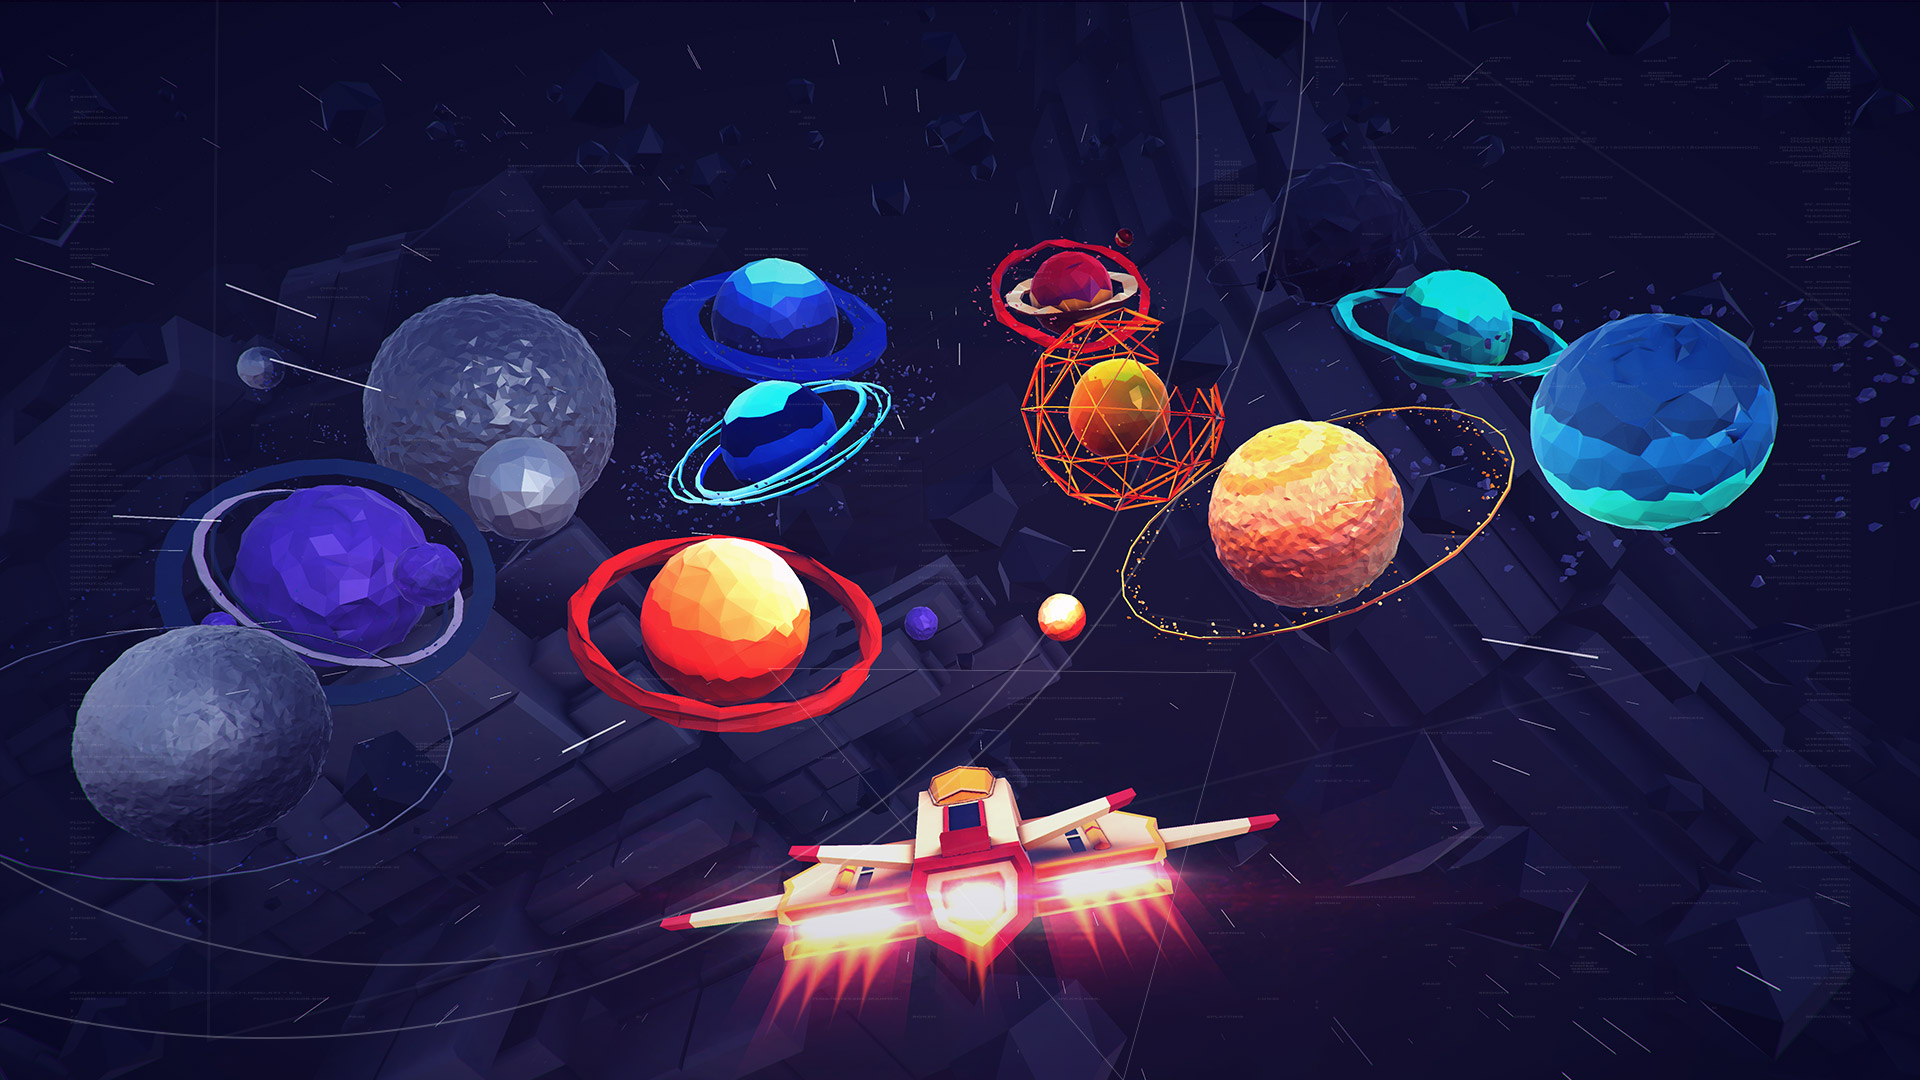 0xUniverse بازی مربوط به ارز دیجیتال